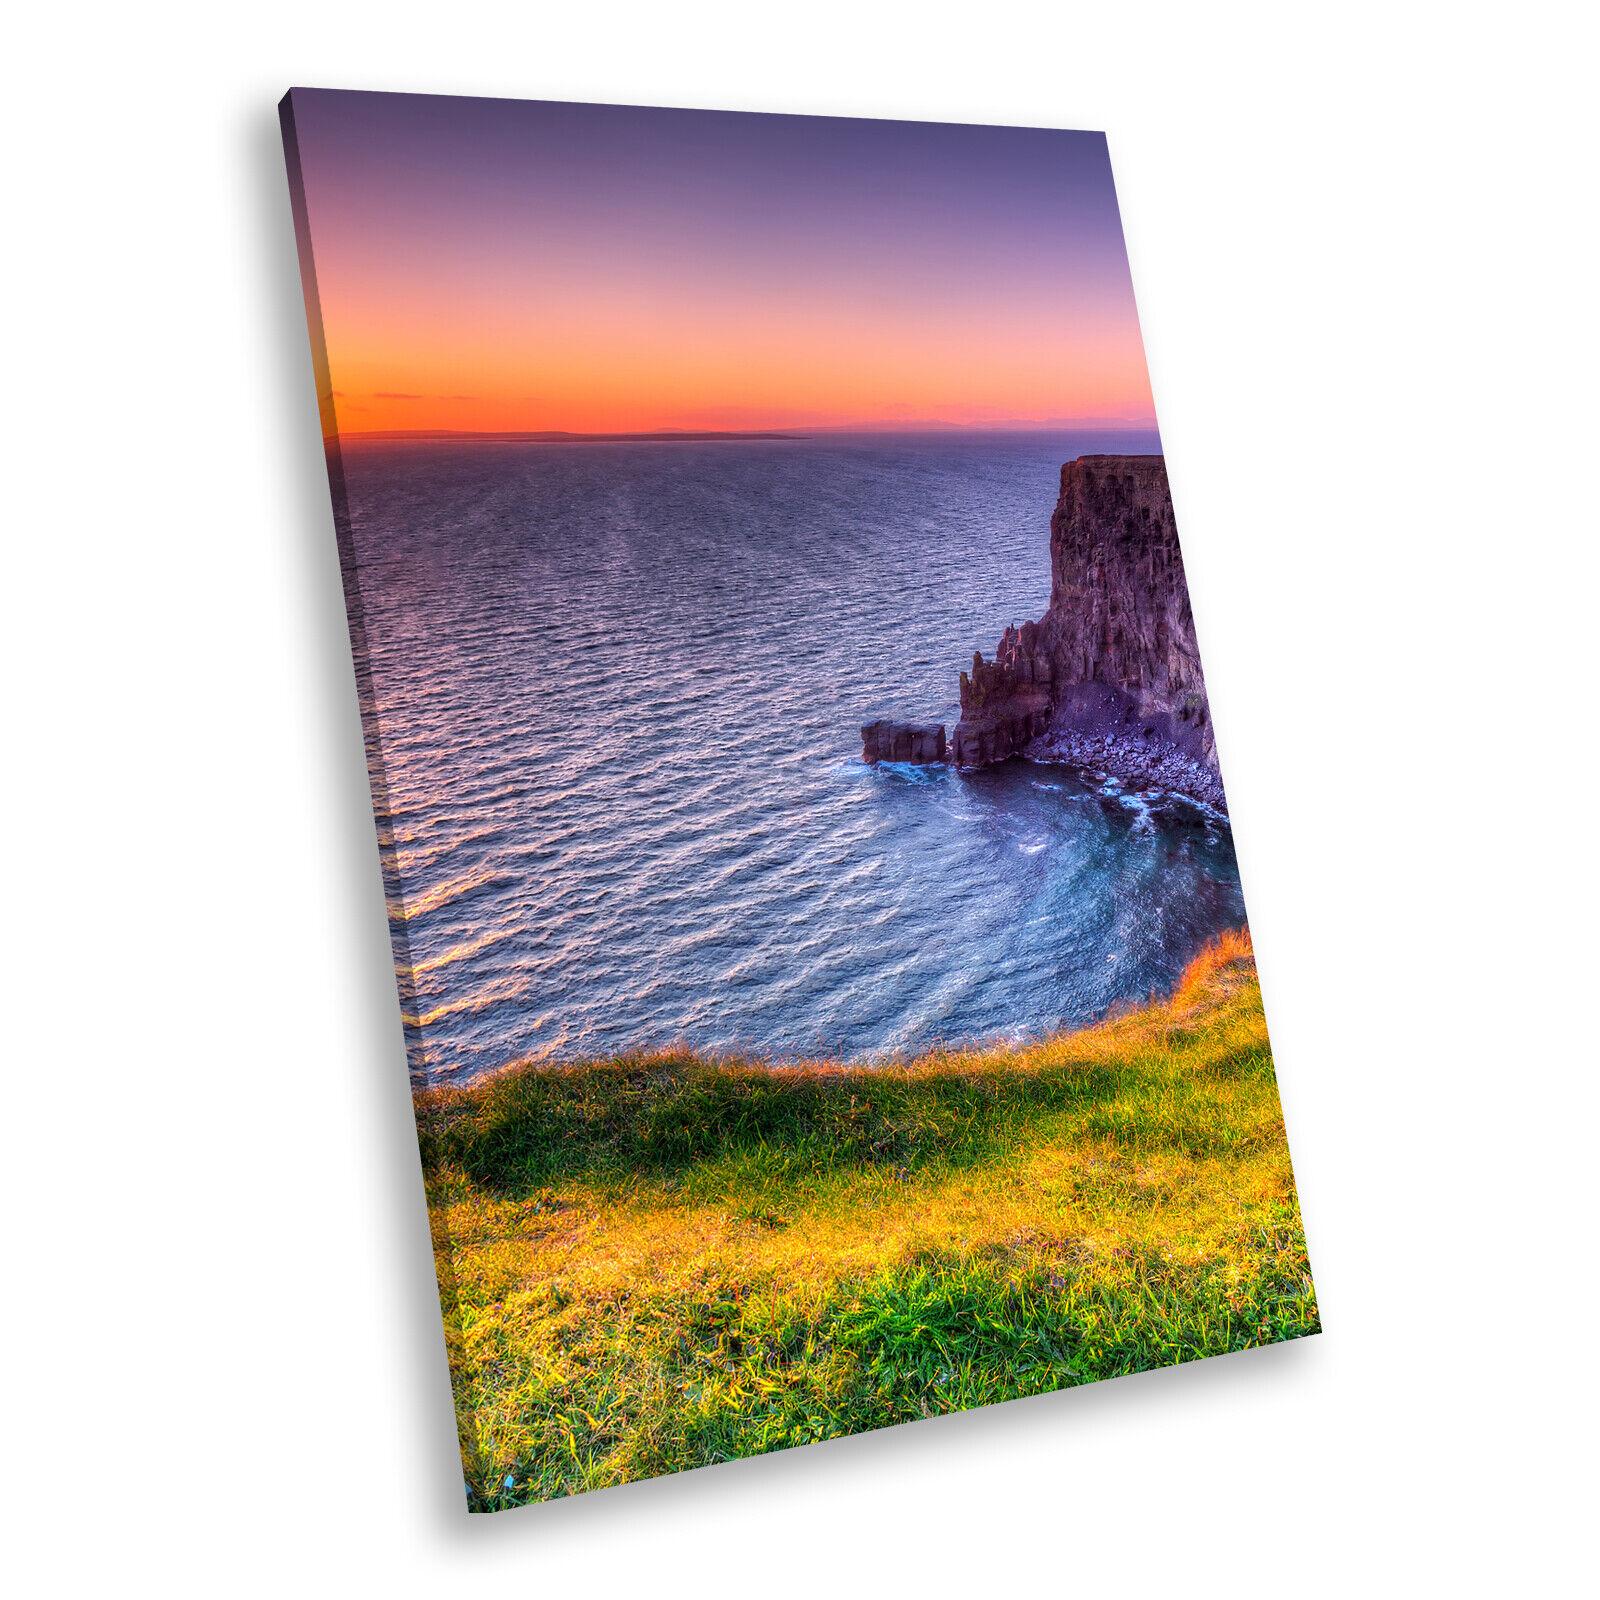 Colourful Cliff Sunset Nature Portrait Scenic Canvas Wall Art Picture Prints